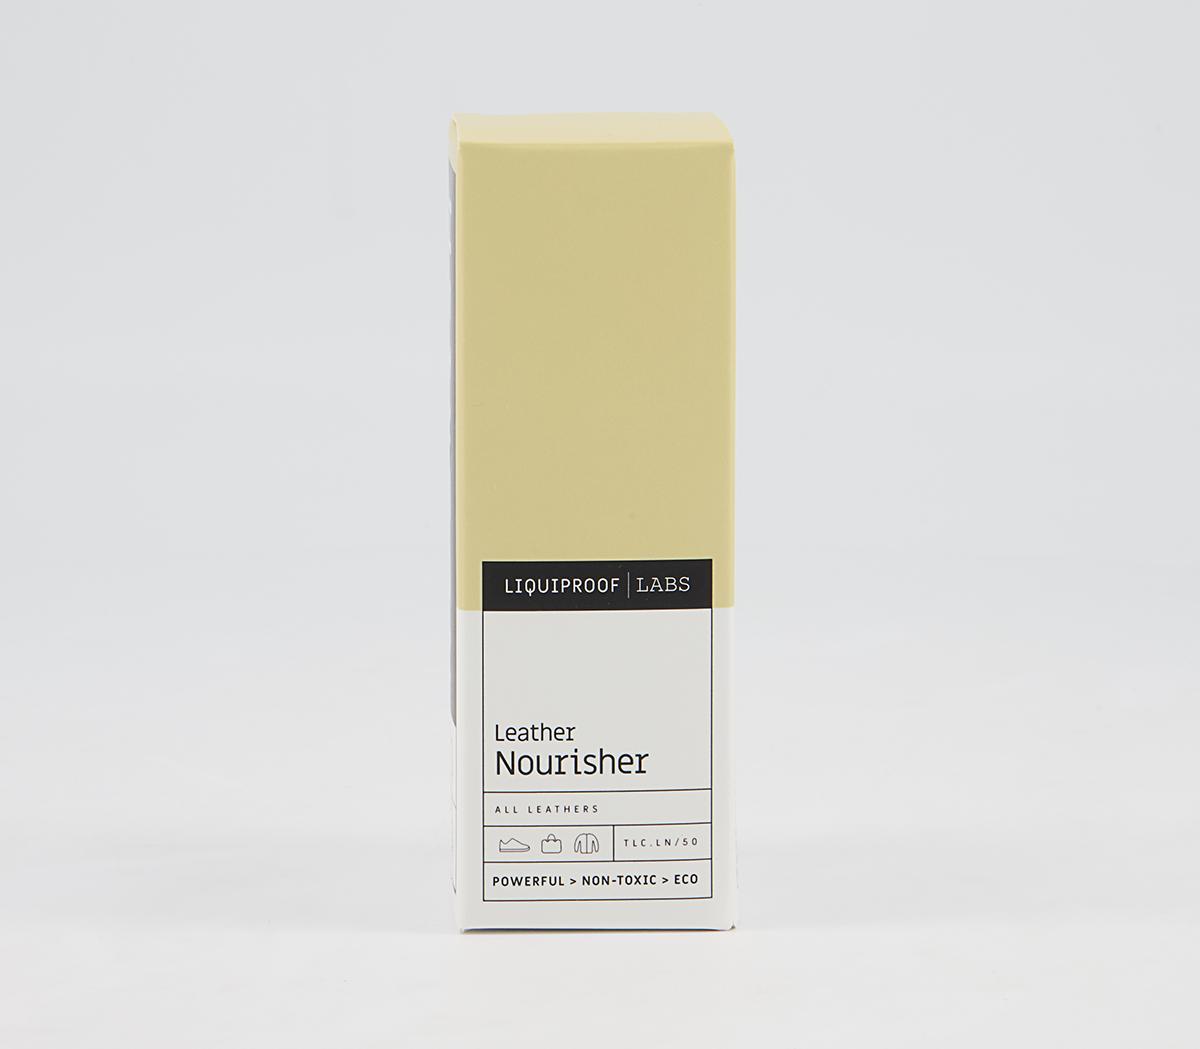 Liquiproof Premium Leather Nourisher 50ml